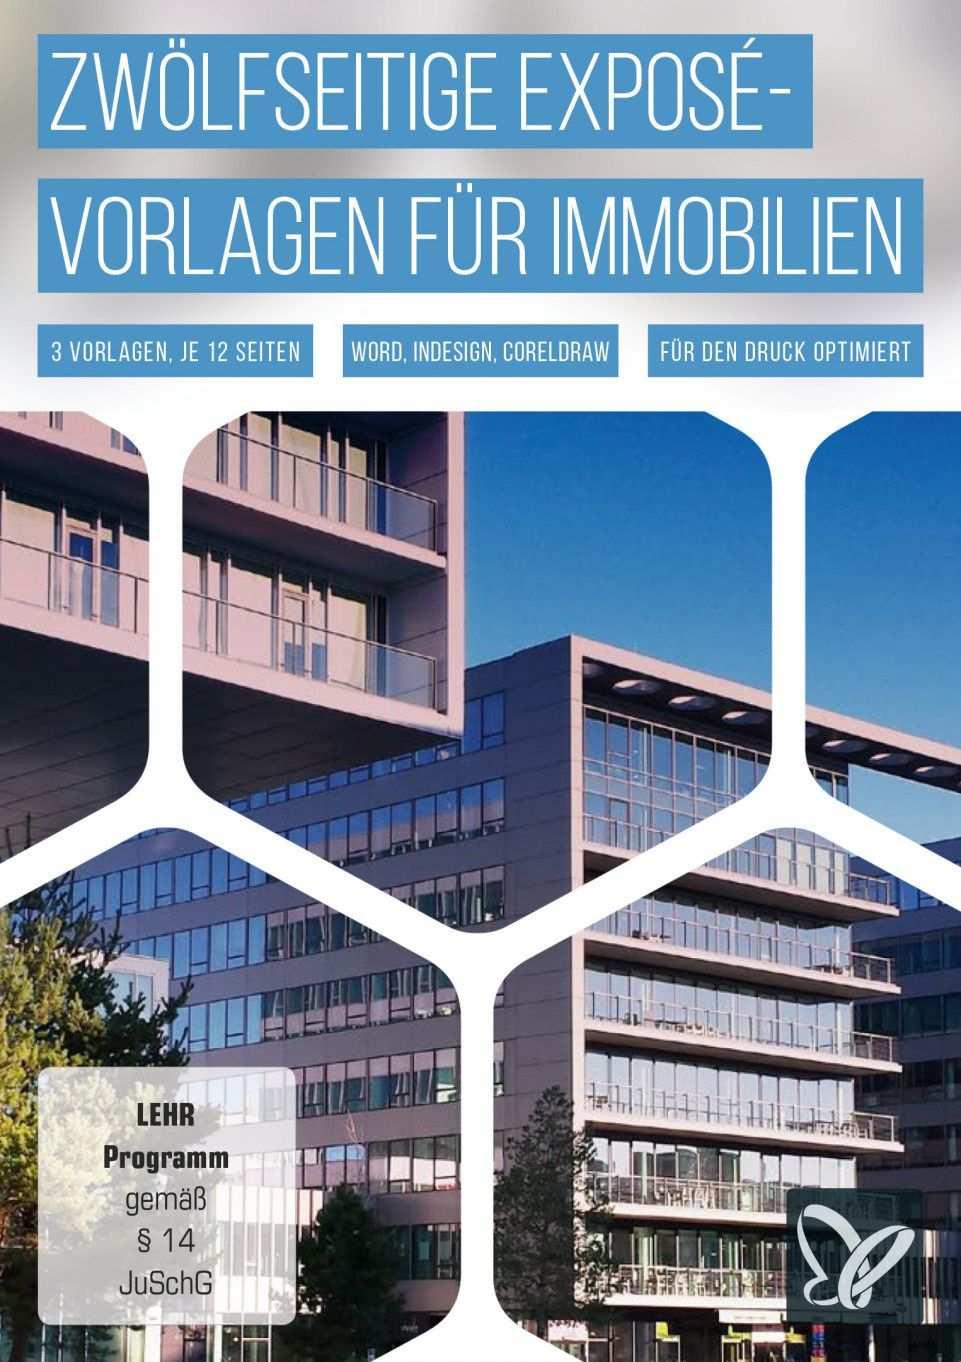 Immobilien Expose Vorlage Word